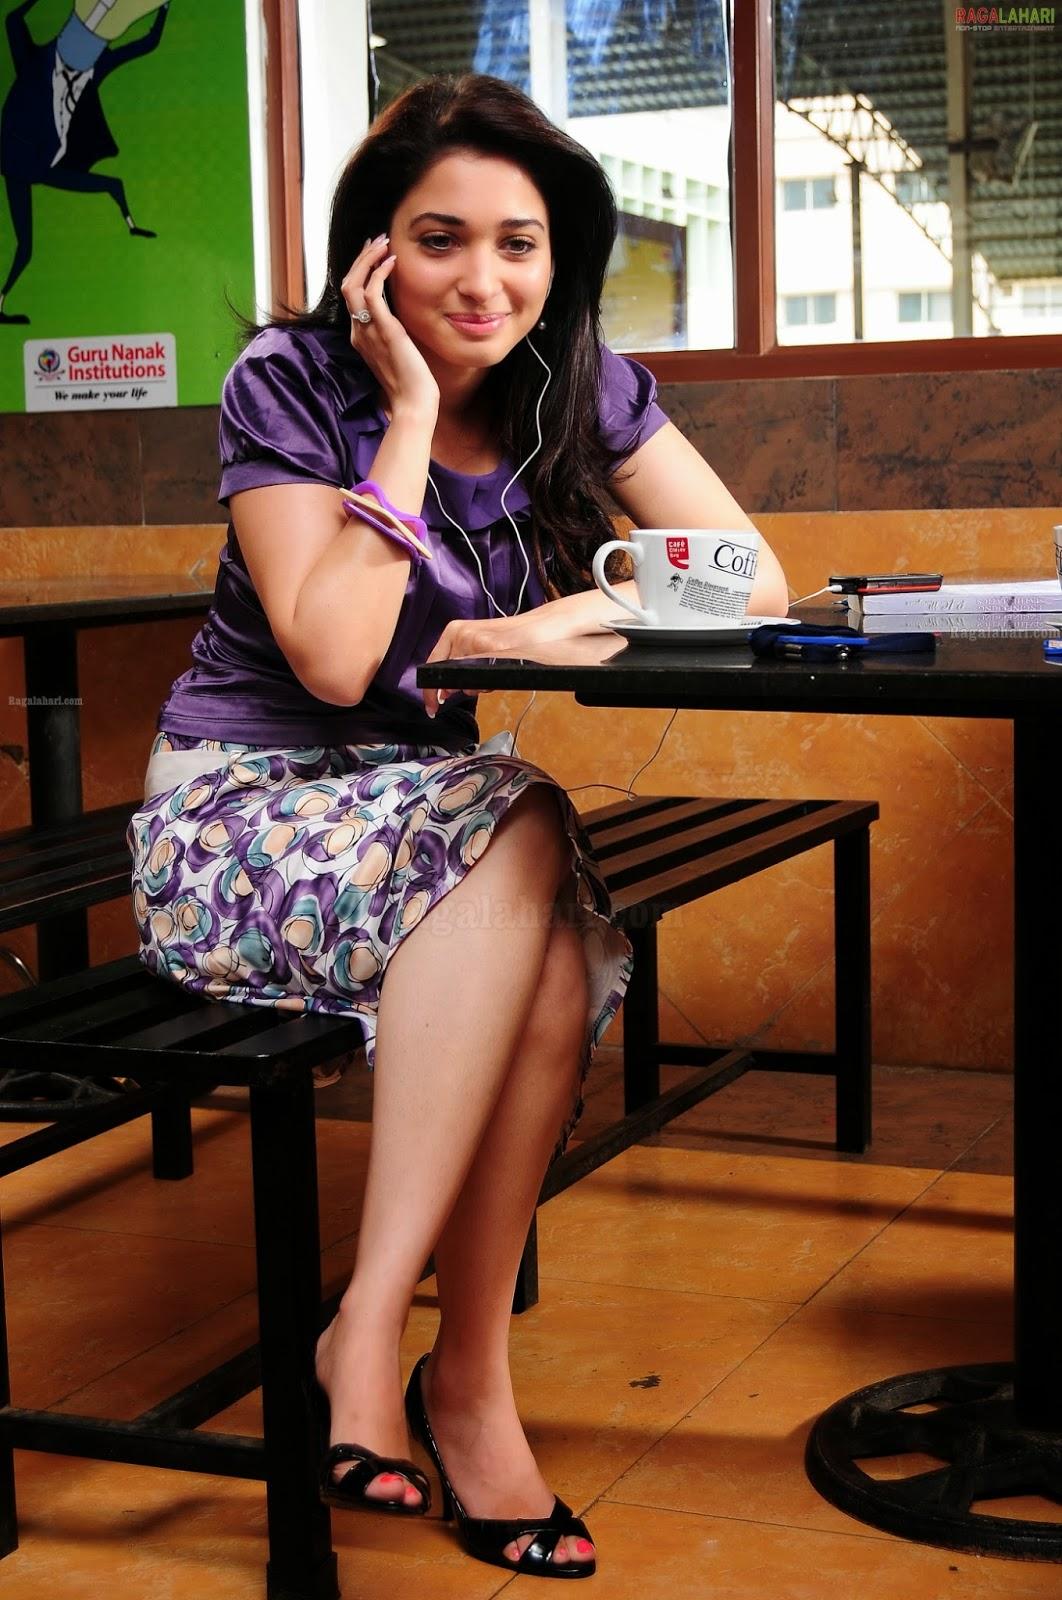 Hot sri lankan tamil teen exposes her delicious body - 4 7